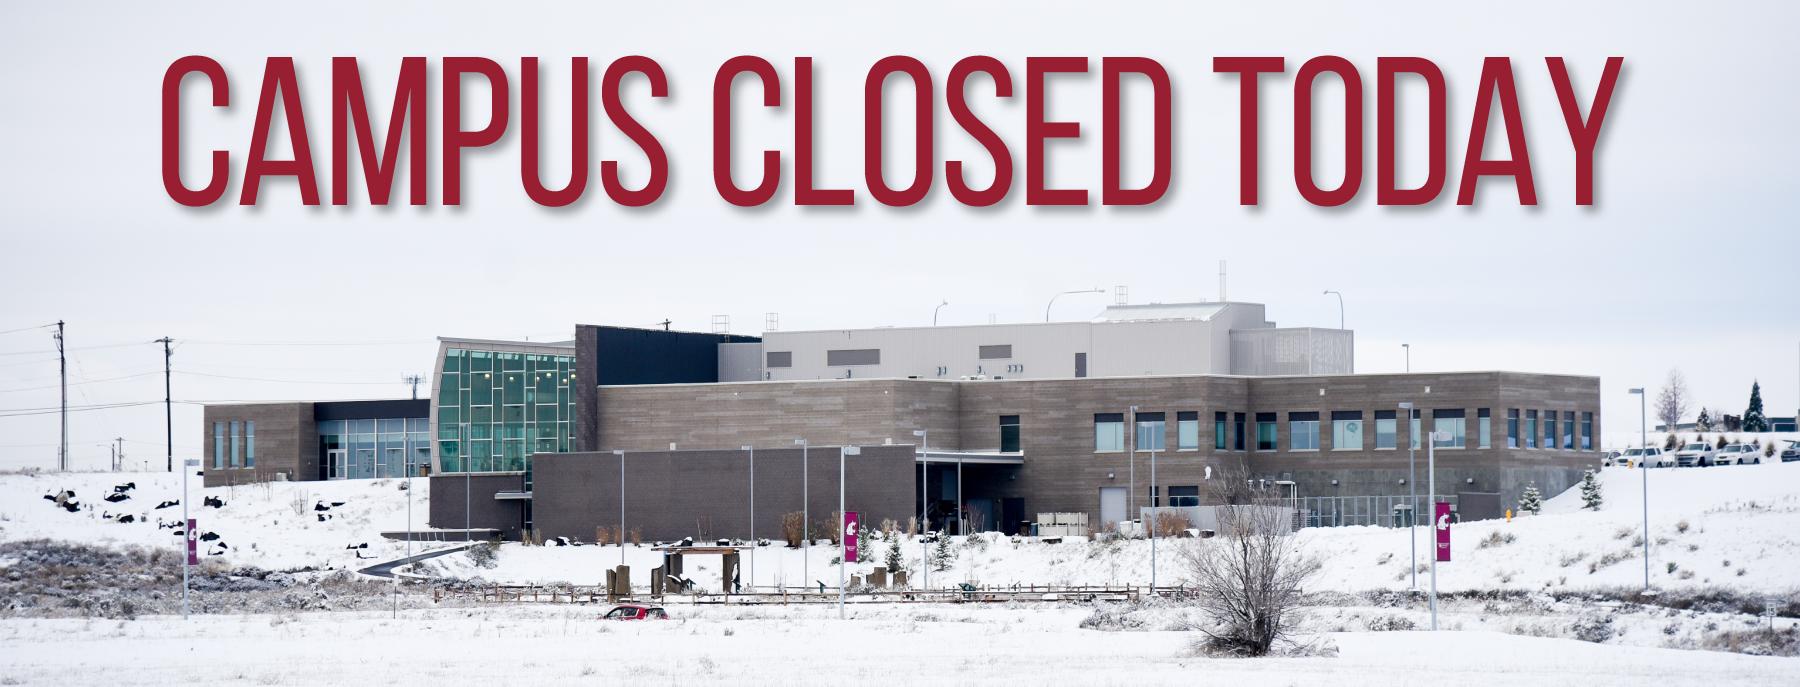 Campus Closed today